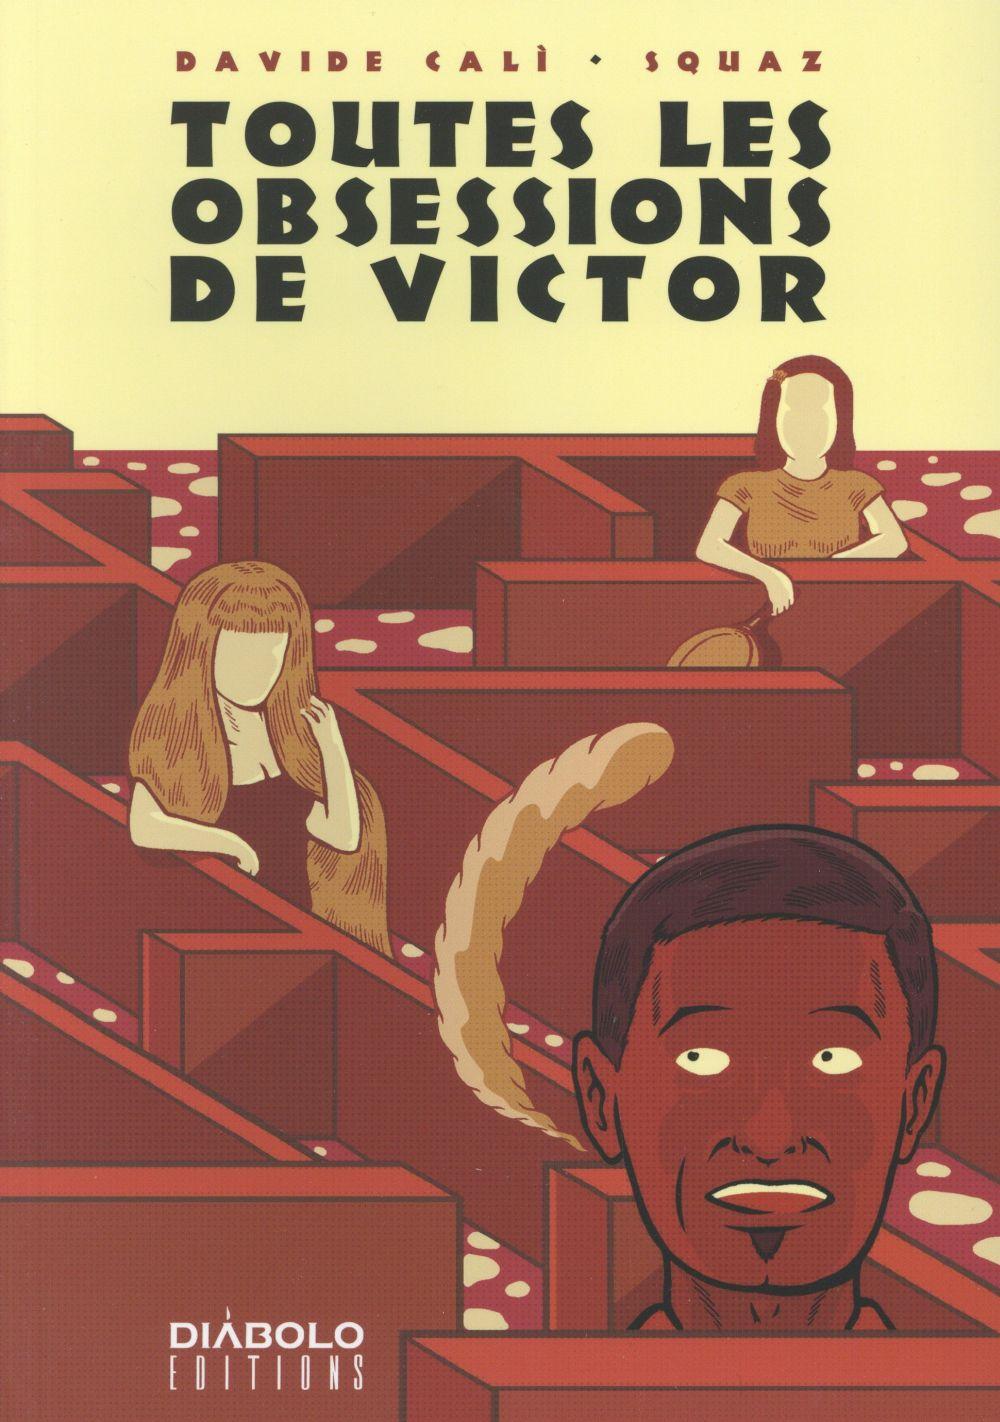 Toutes les obsessions de Victor